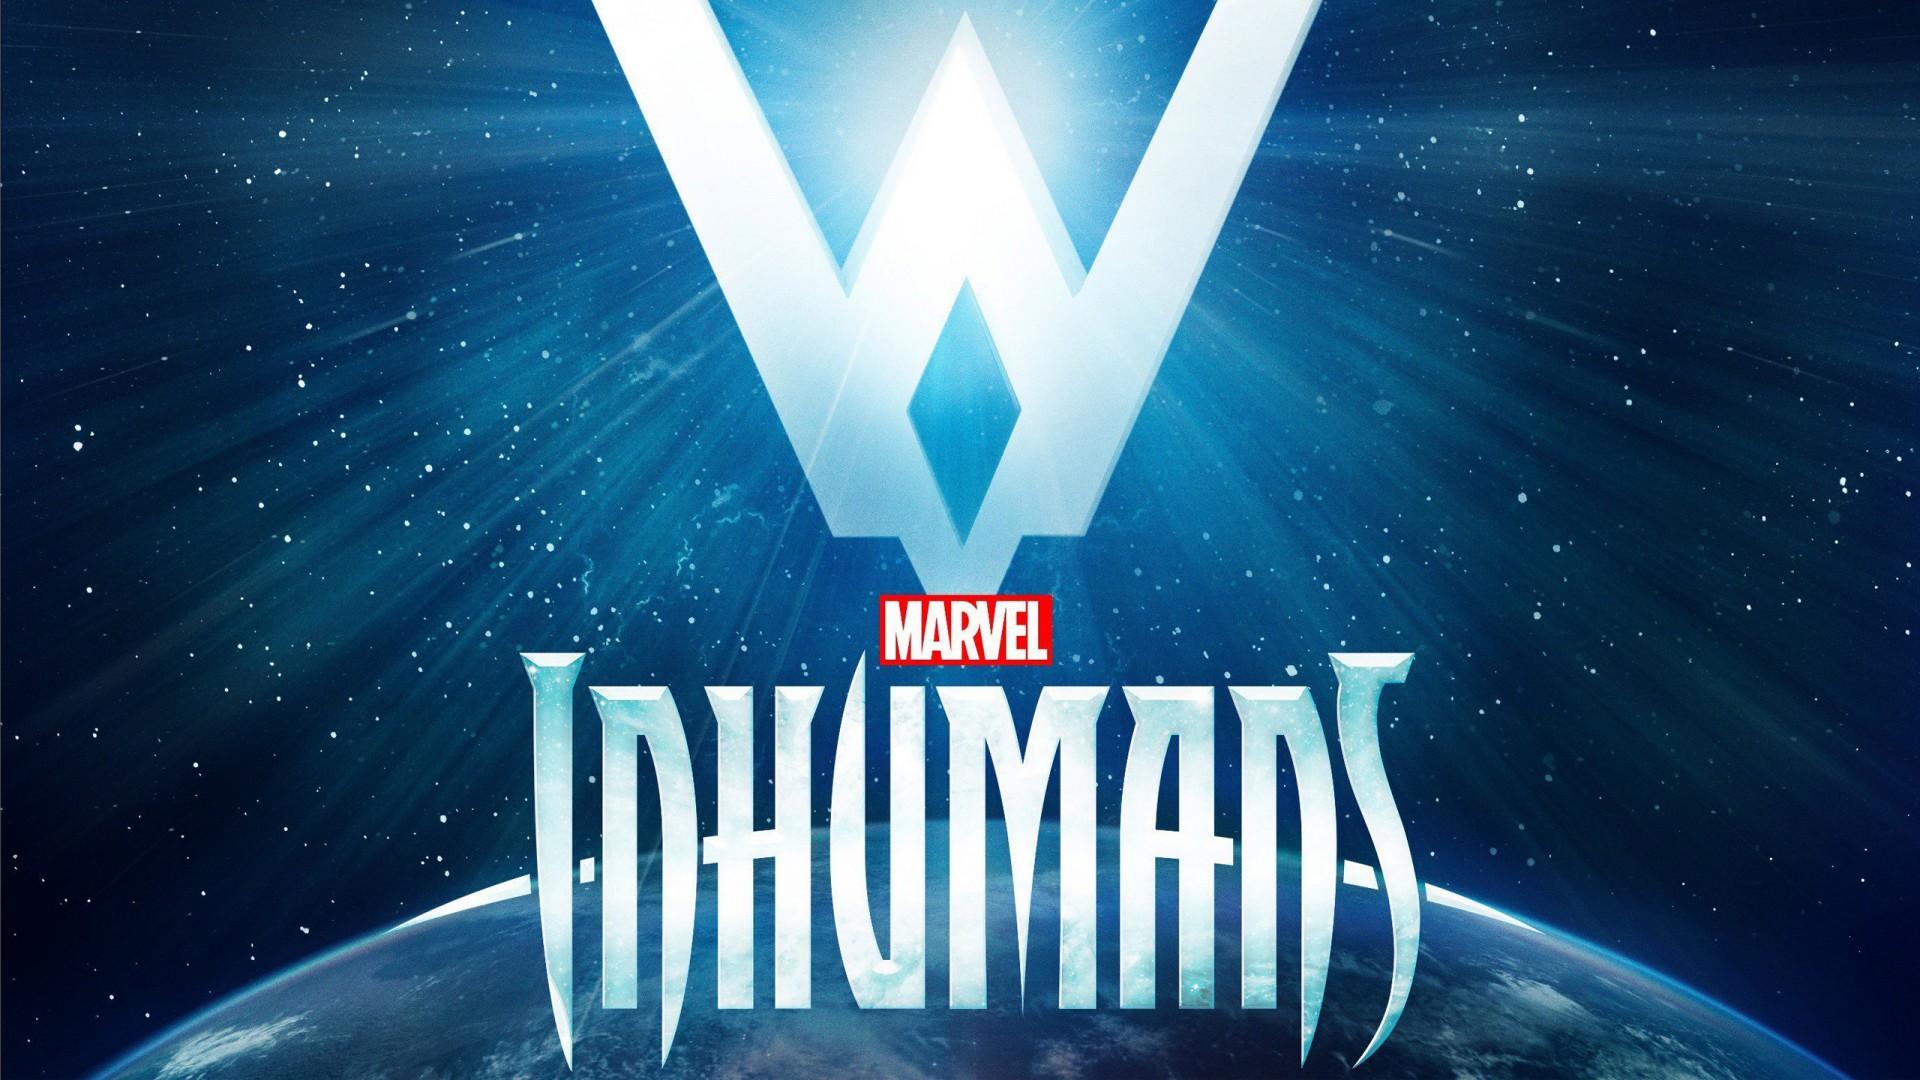 Space Wallpaper 4k Iphone X Inhumans Marvel Tv Series 2017 Wallpapers Hd Wallpapers